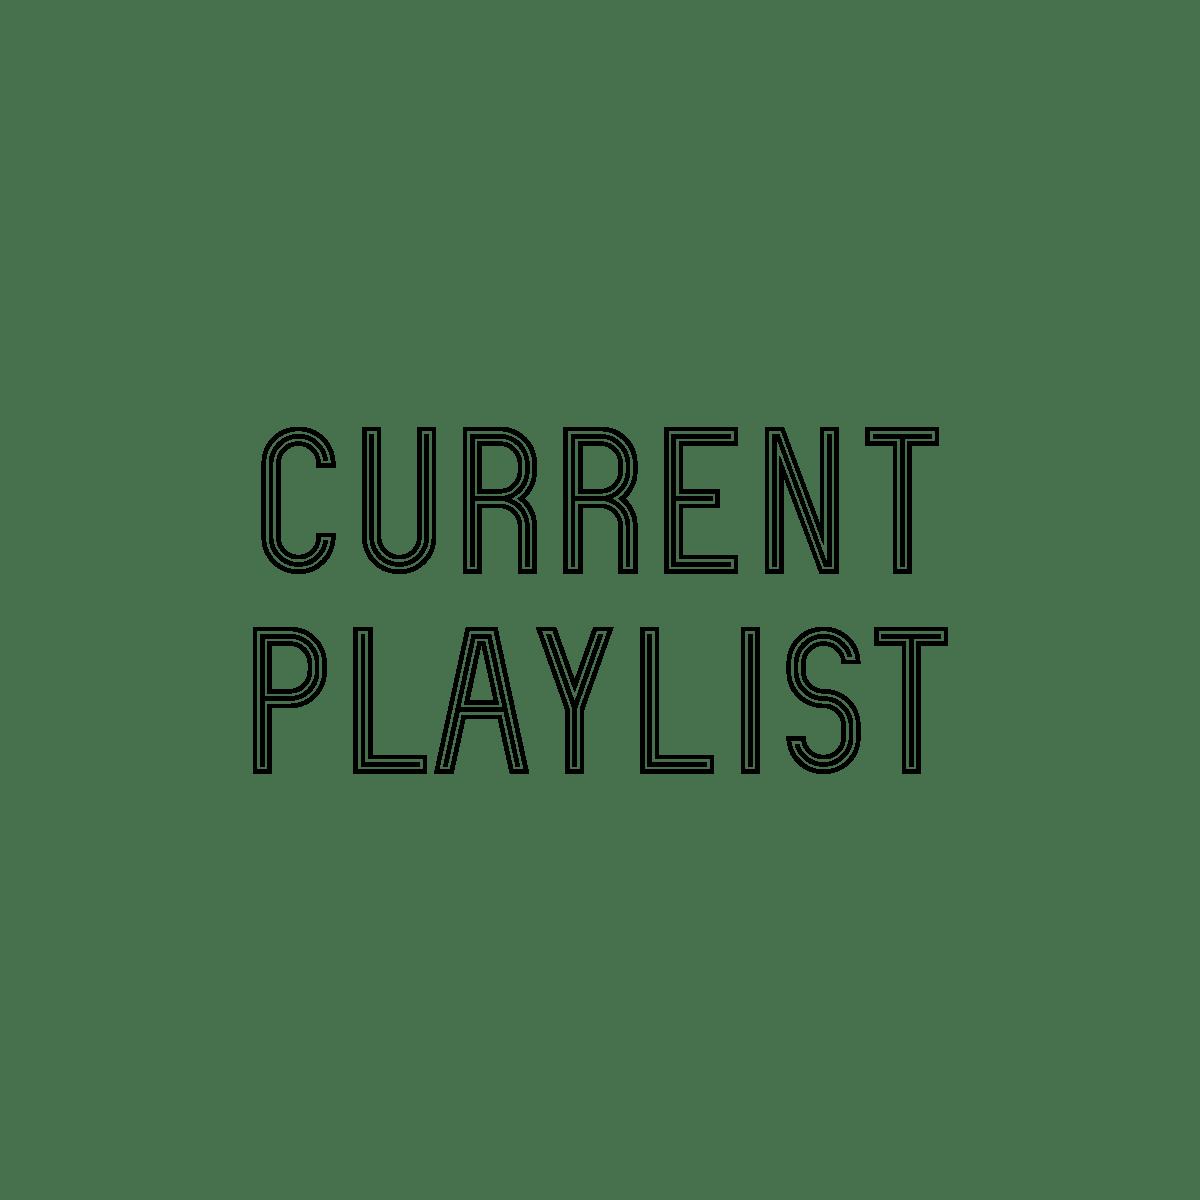 Current Playlist